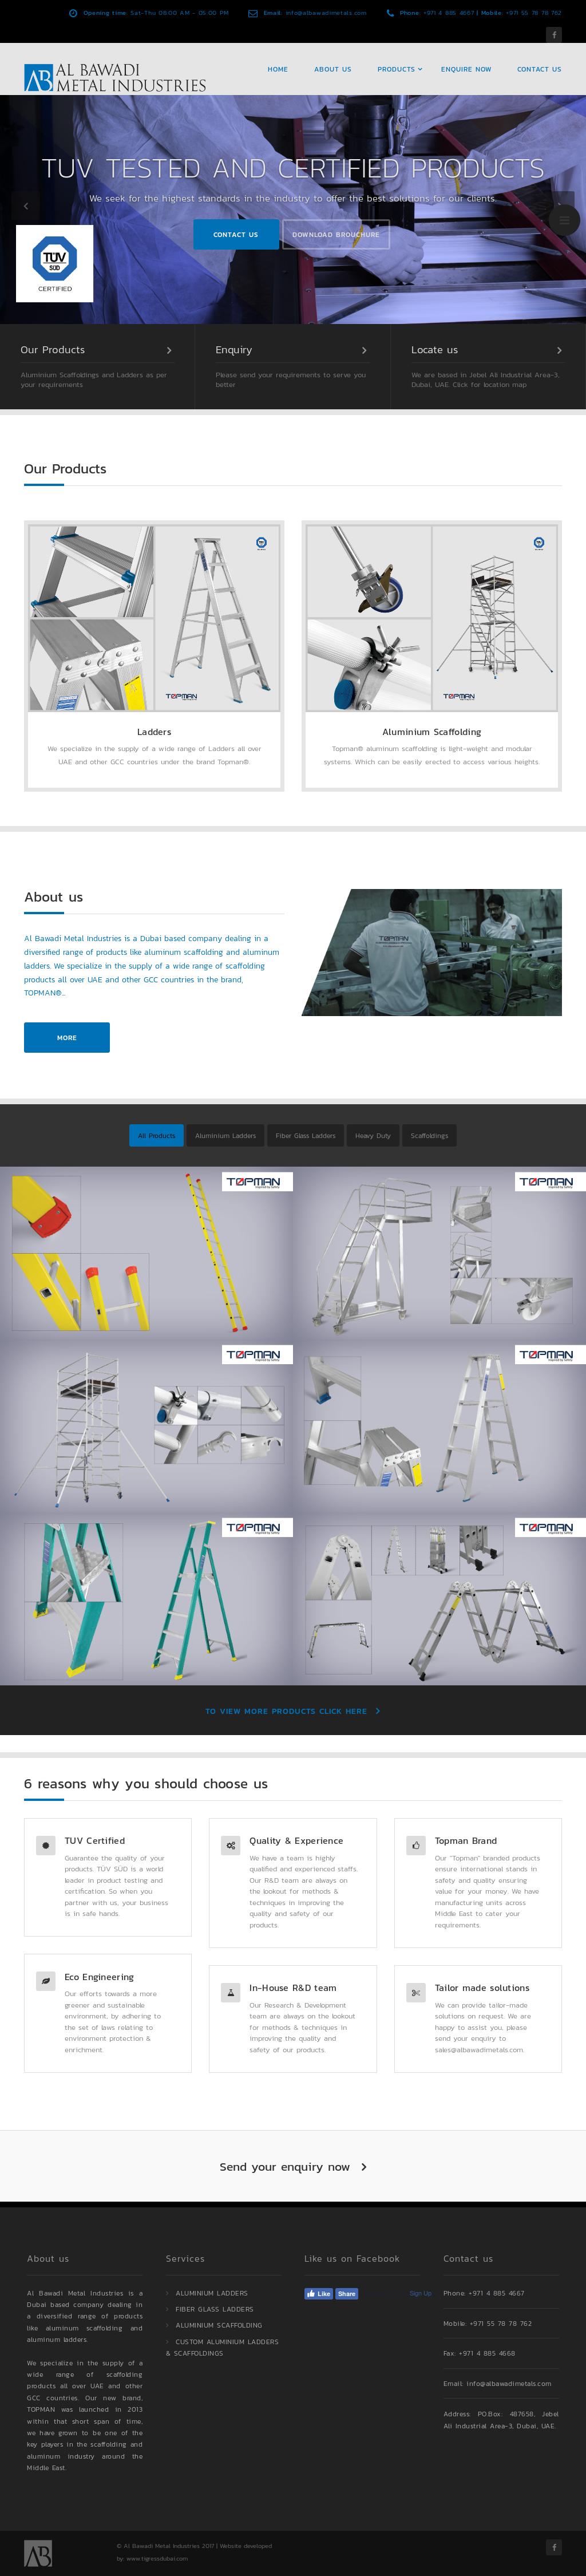 Al Bawadi Metal Industries Competitors, Revenue and